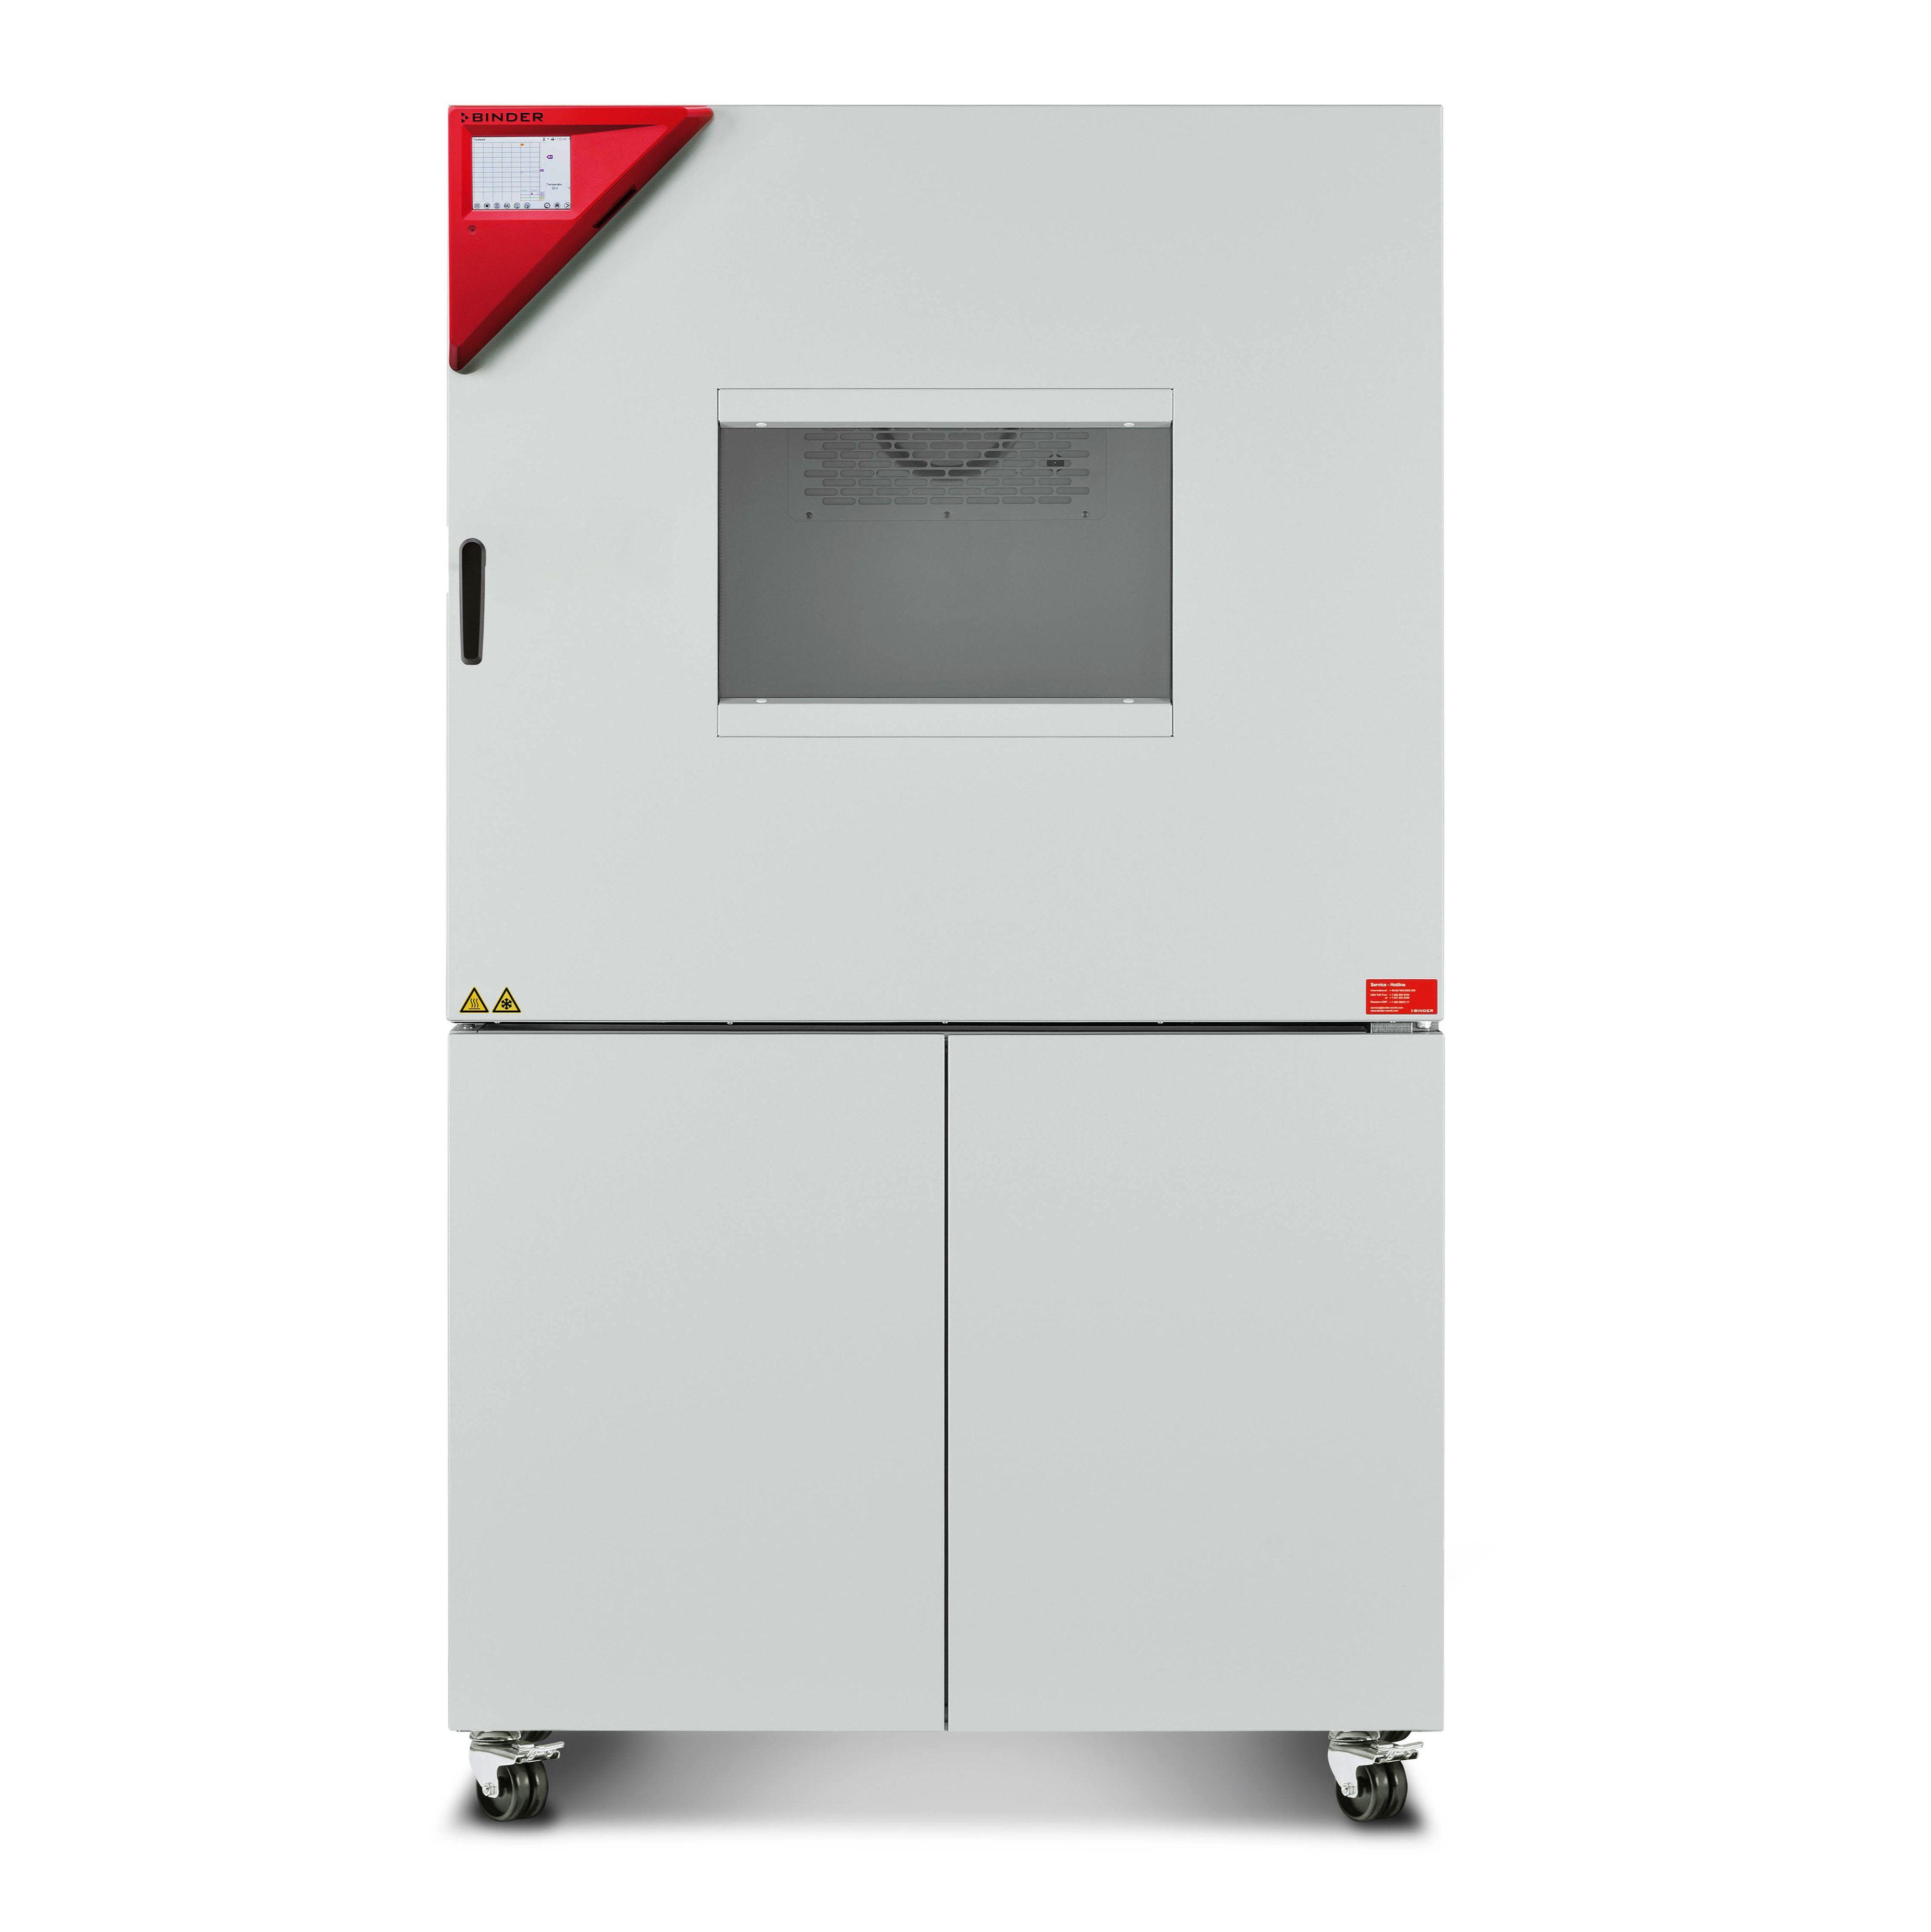 环境模拟箱BINDER MKT240